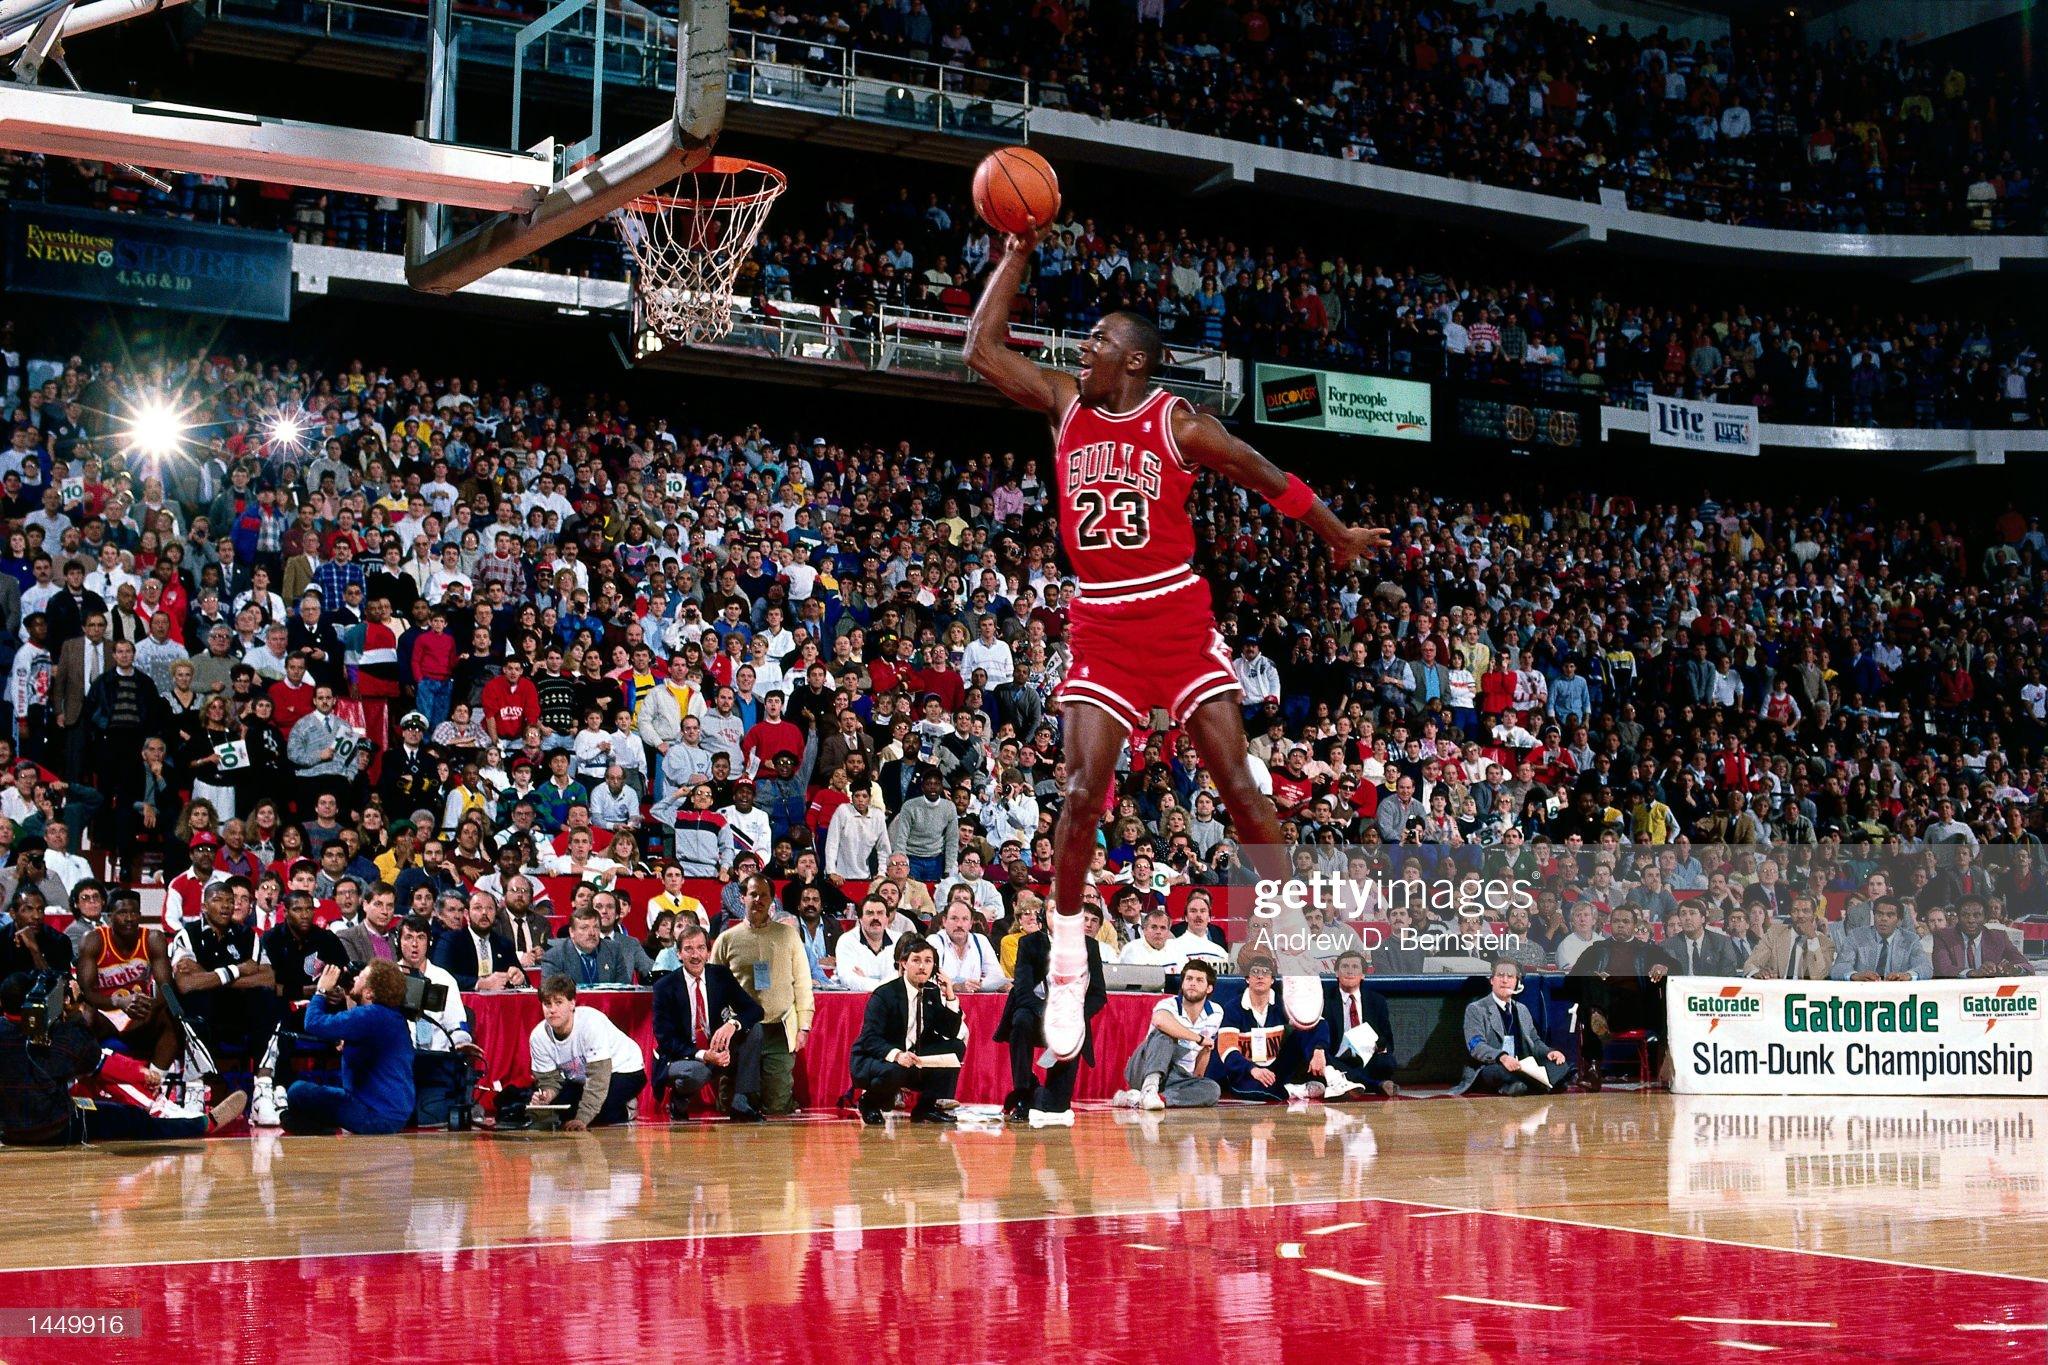 Jordan Slam Dunk Competition : News Photo, conspiracy